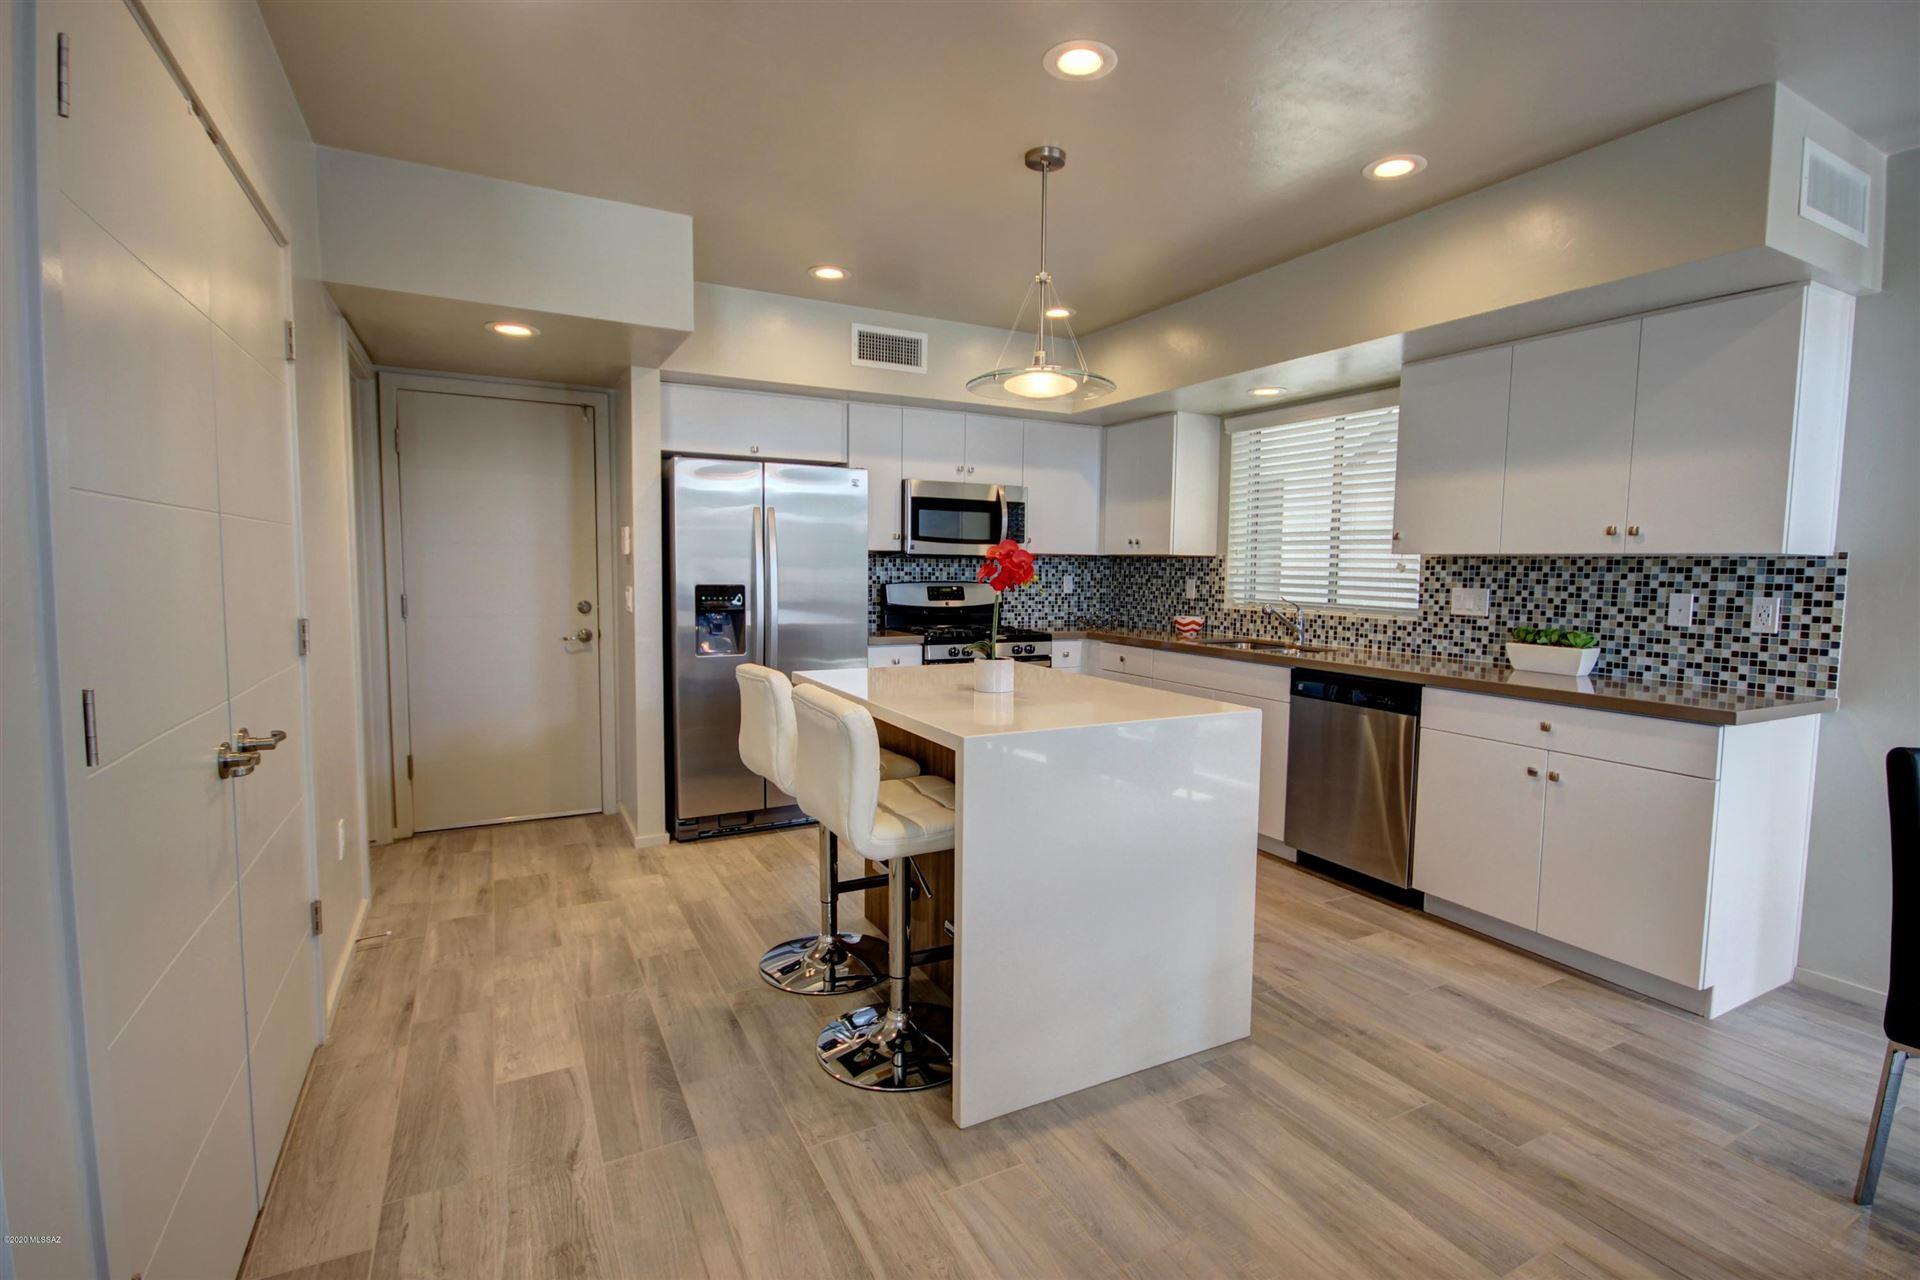 410 S Contempo Drive, Tucson, AZ 85710 - MLS#: 22006933